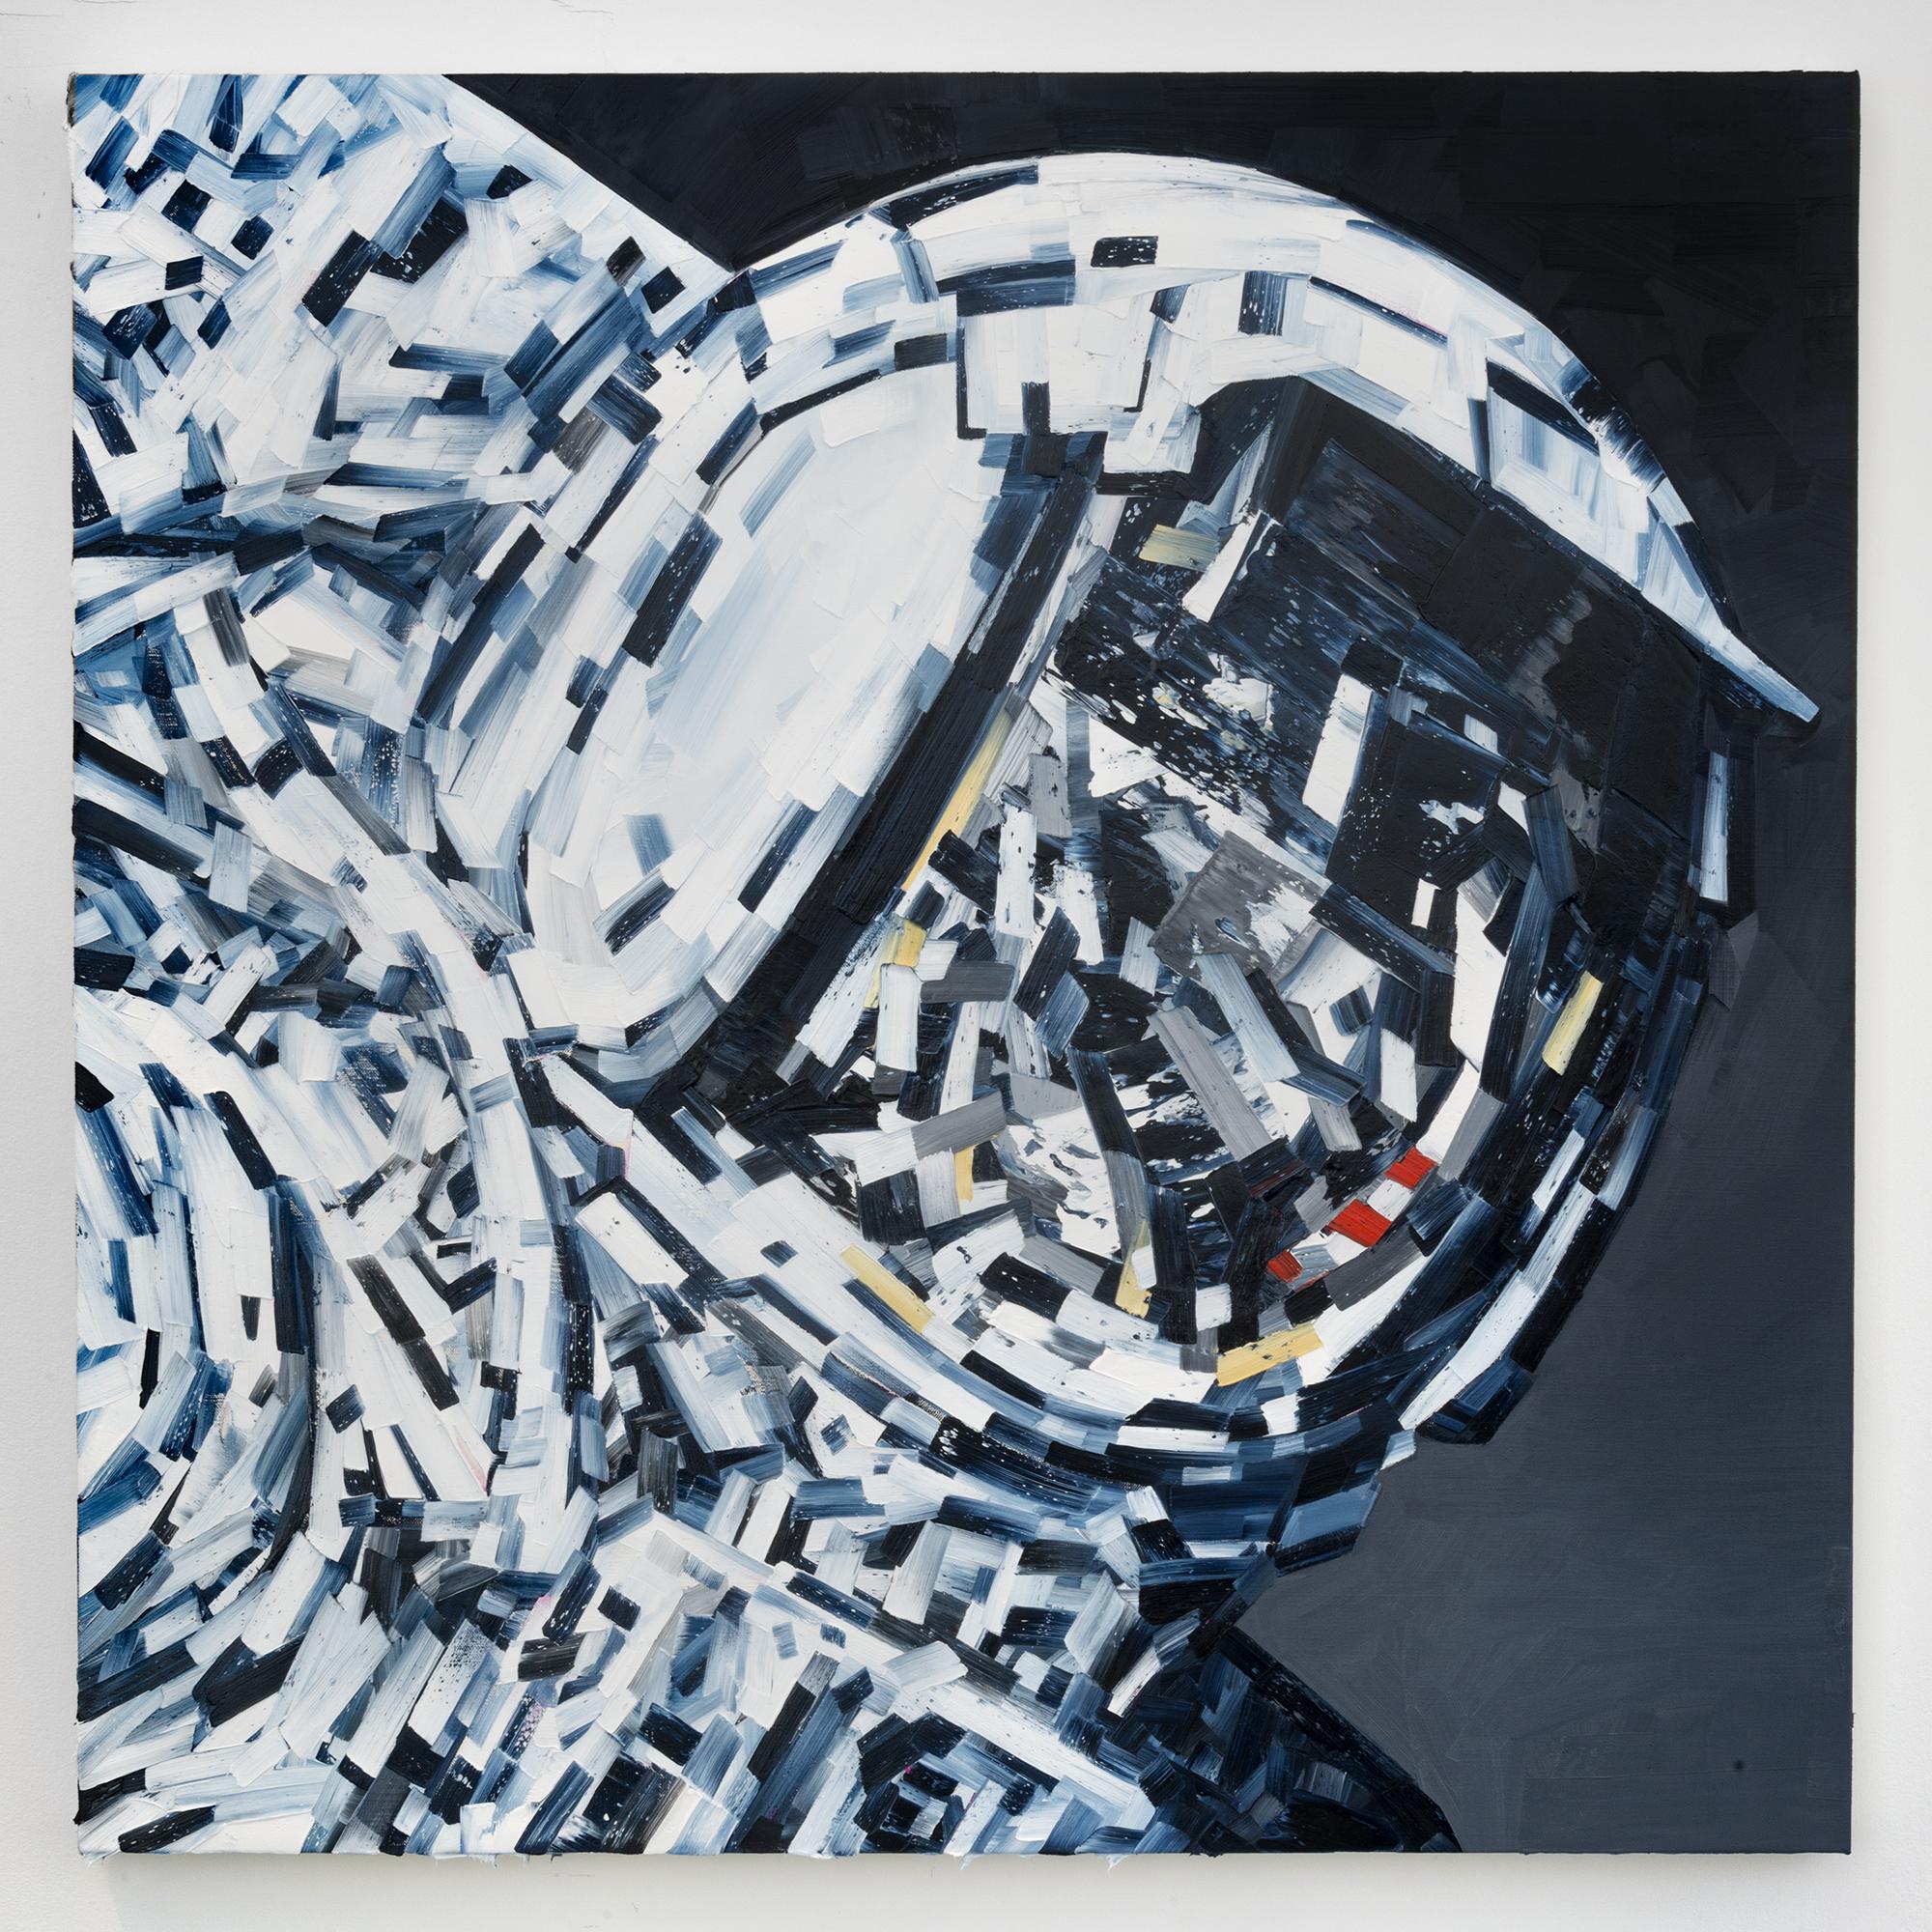 Michael Kagan  Moonwalk, 2018  Oil on linen  36h x 36w in  91.44h x 91.44w cm  MK007